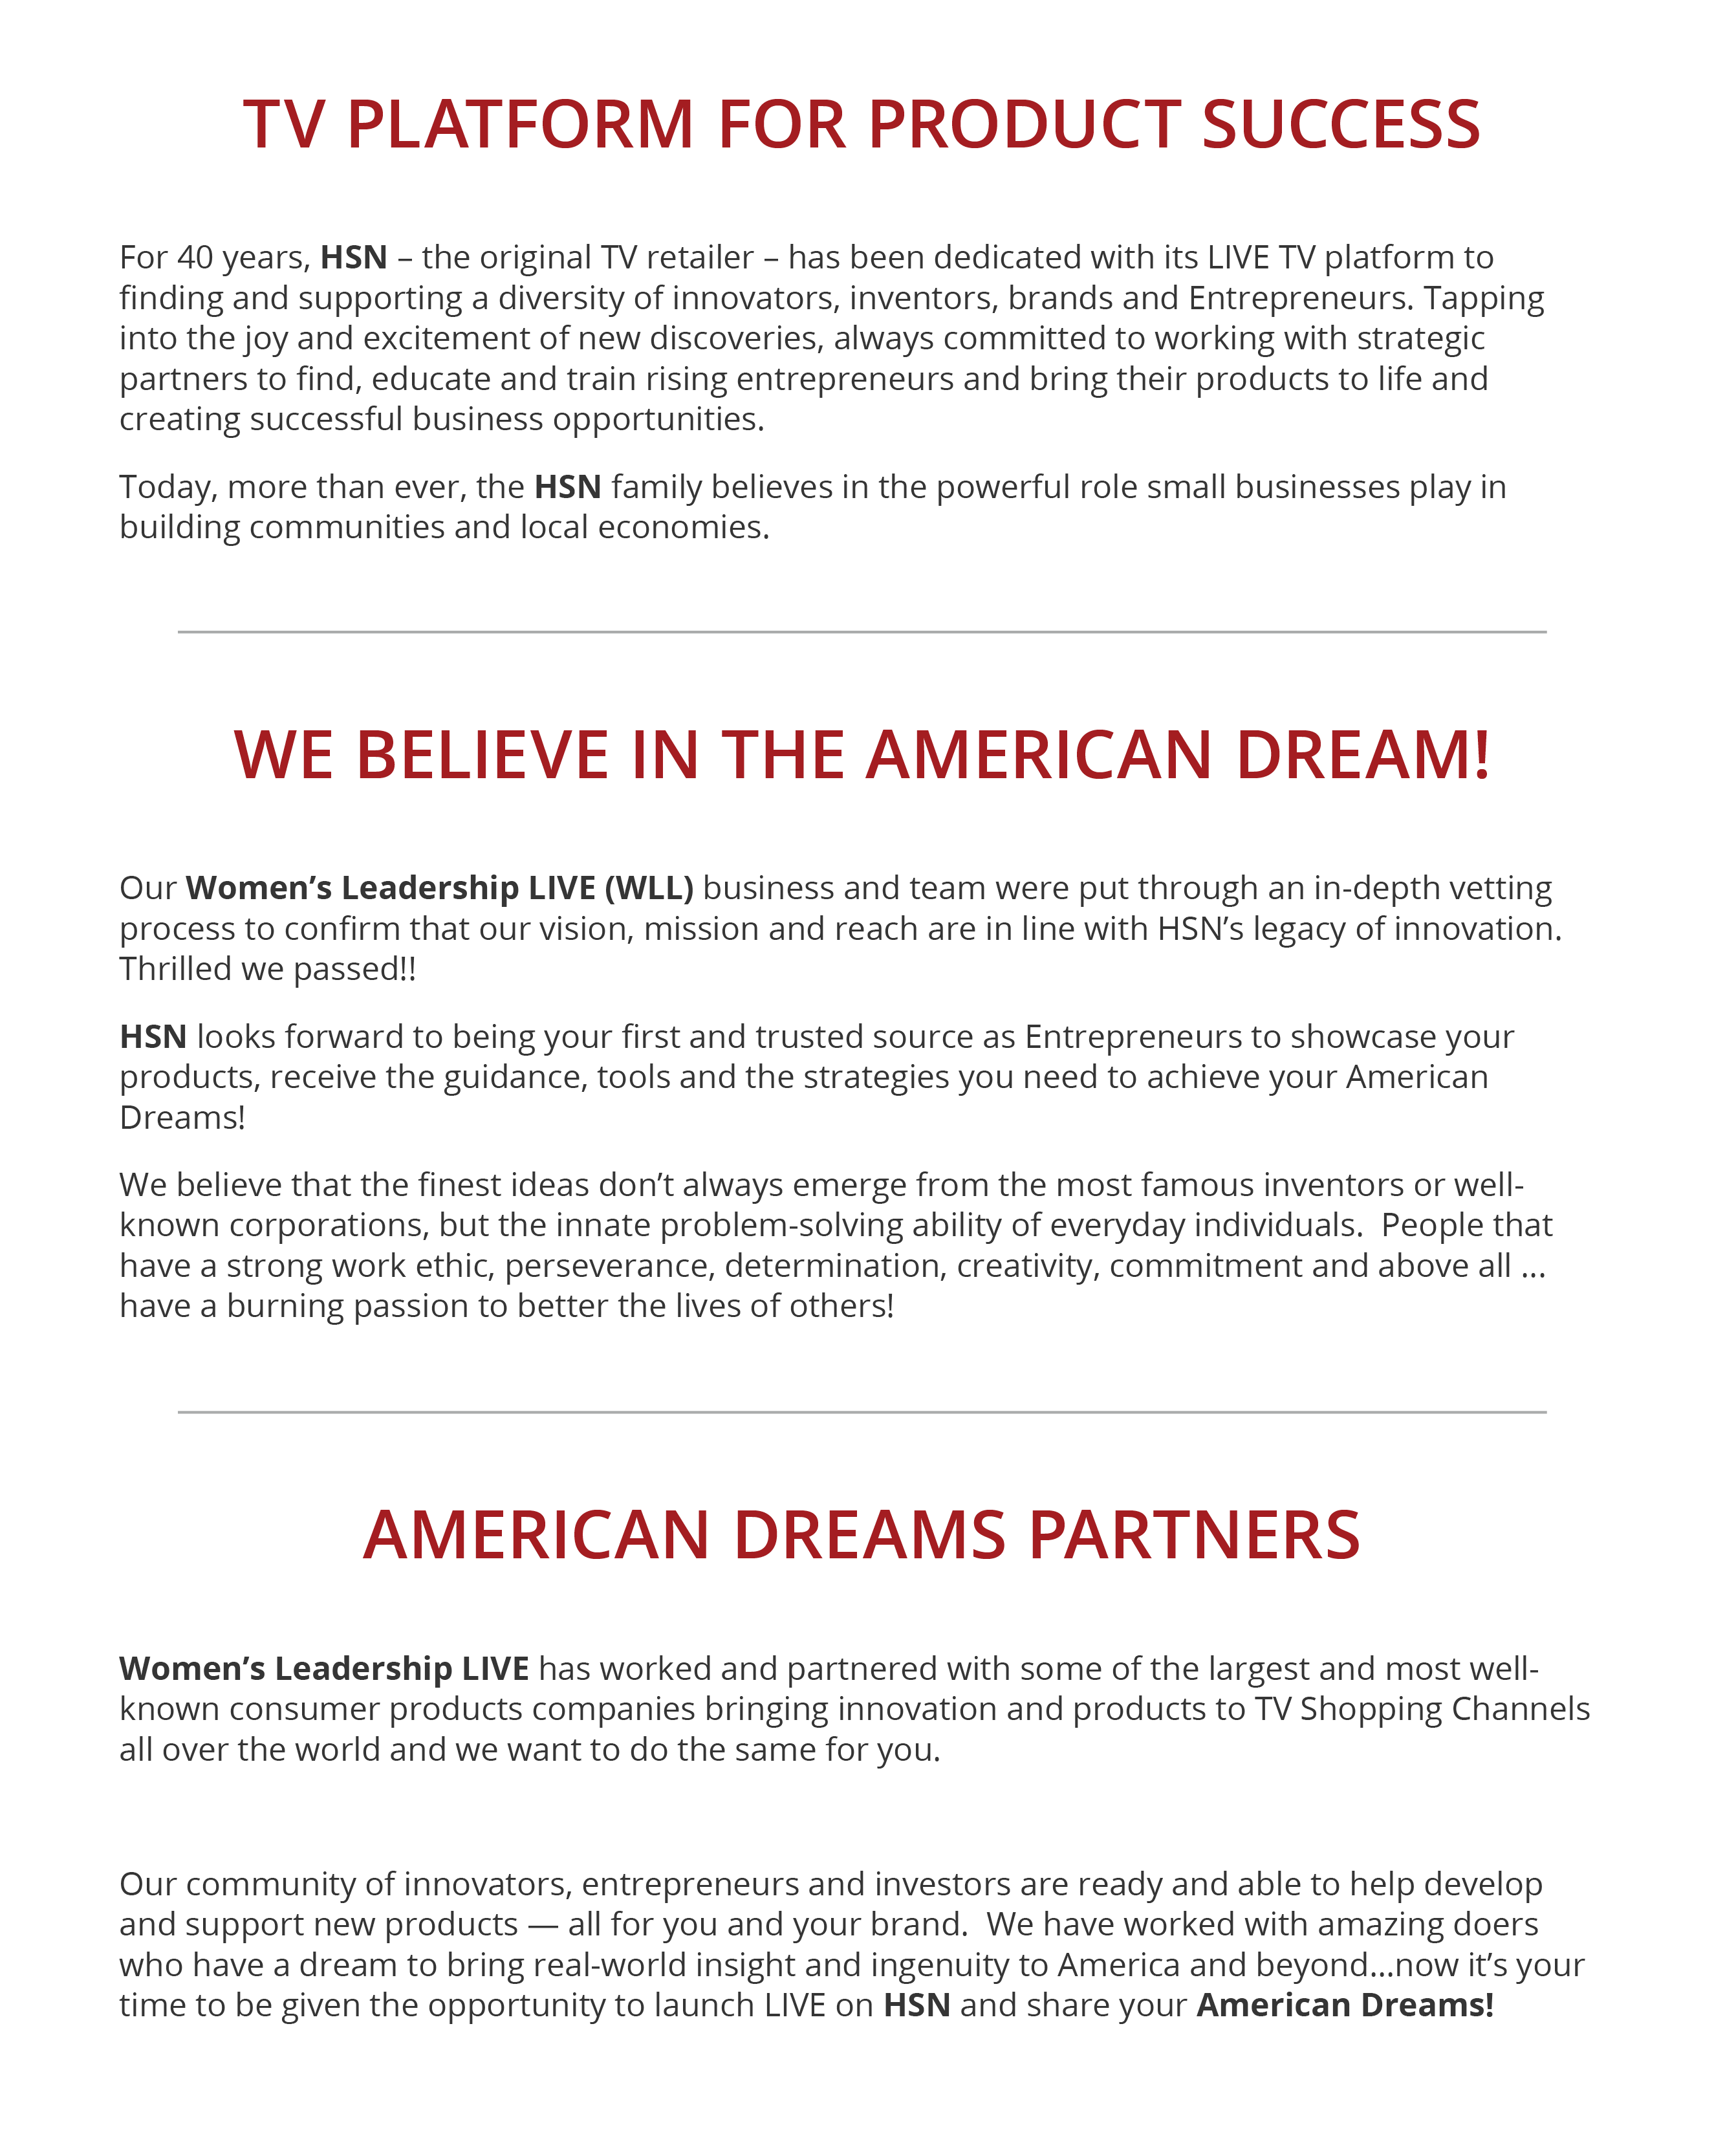 American Dreams Web Graphic Text Part 1